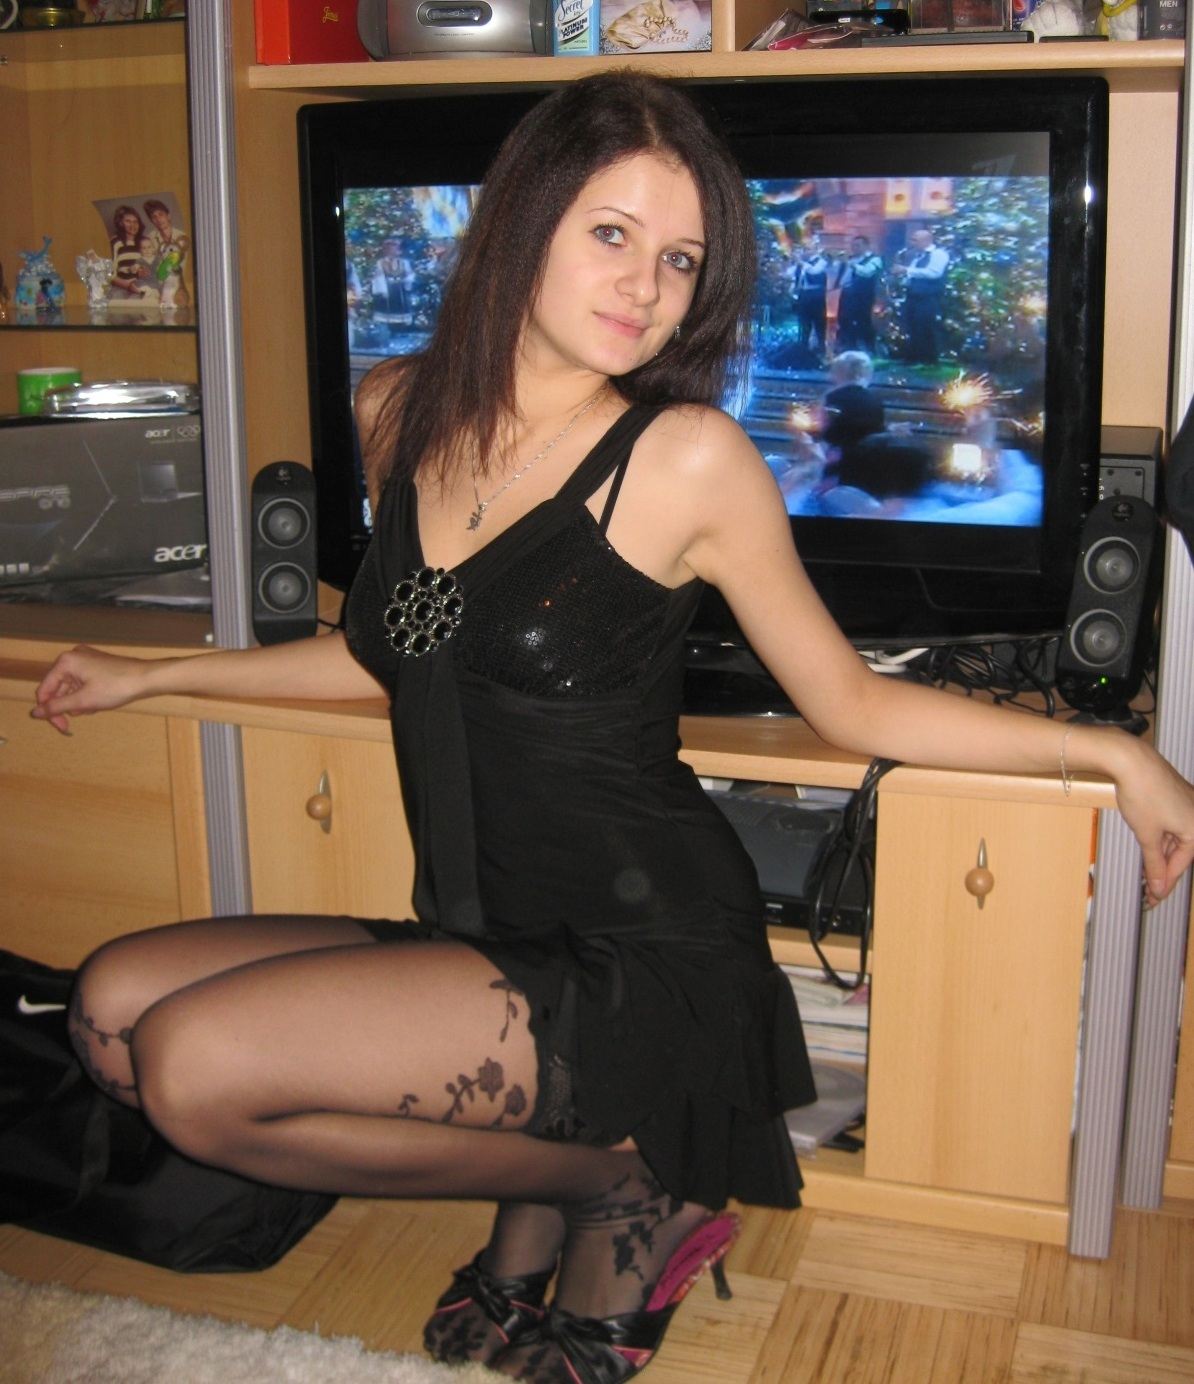 Сайт домашние девушки фото